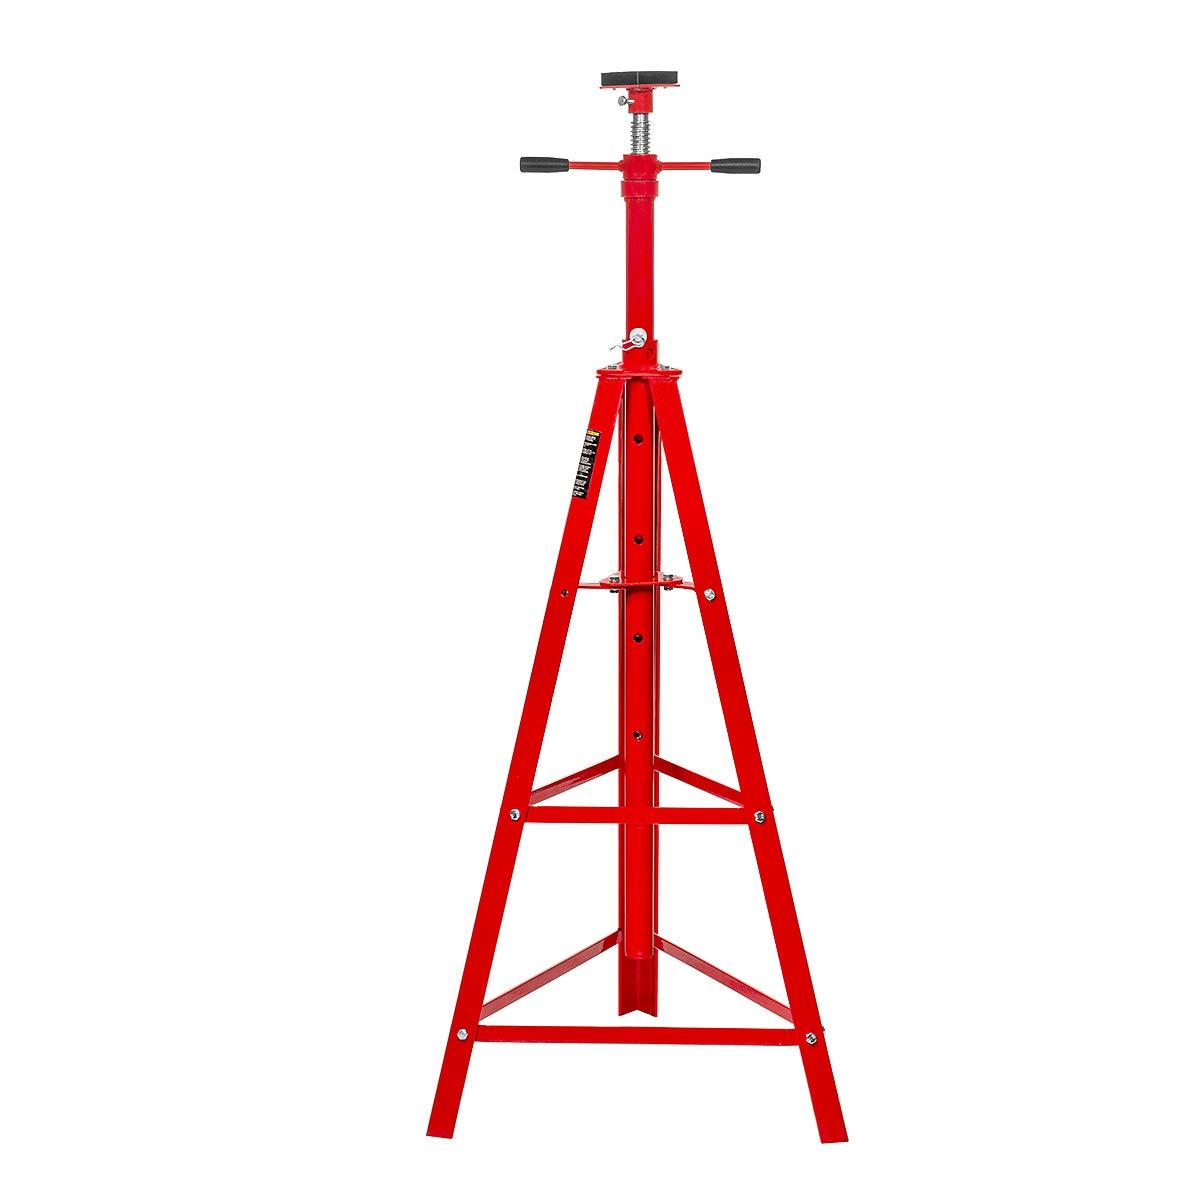 Stark Underhoist Tripod Stand 2 Ton Capacity High Lift Jack Stand Reach Under Hoist Stand High-Position Lift Range, Red by Stark USA